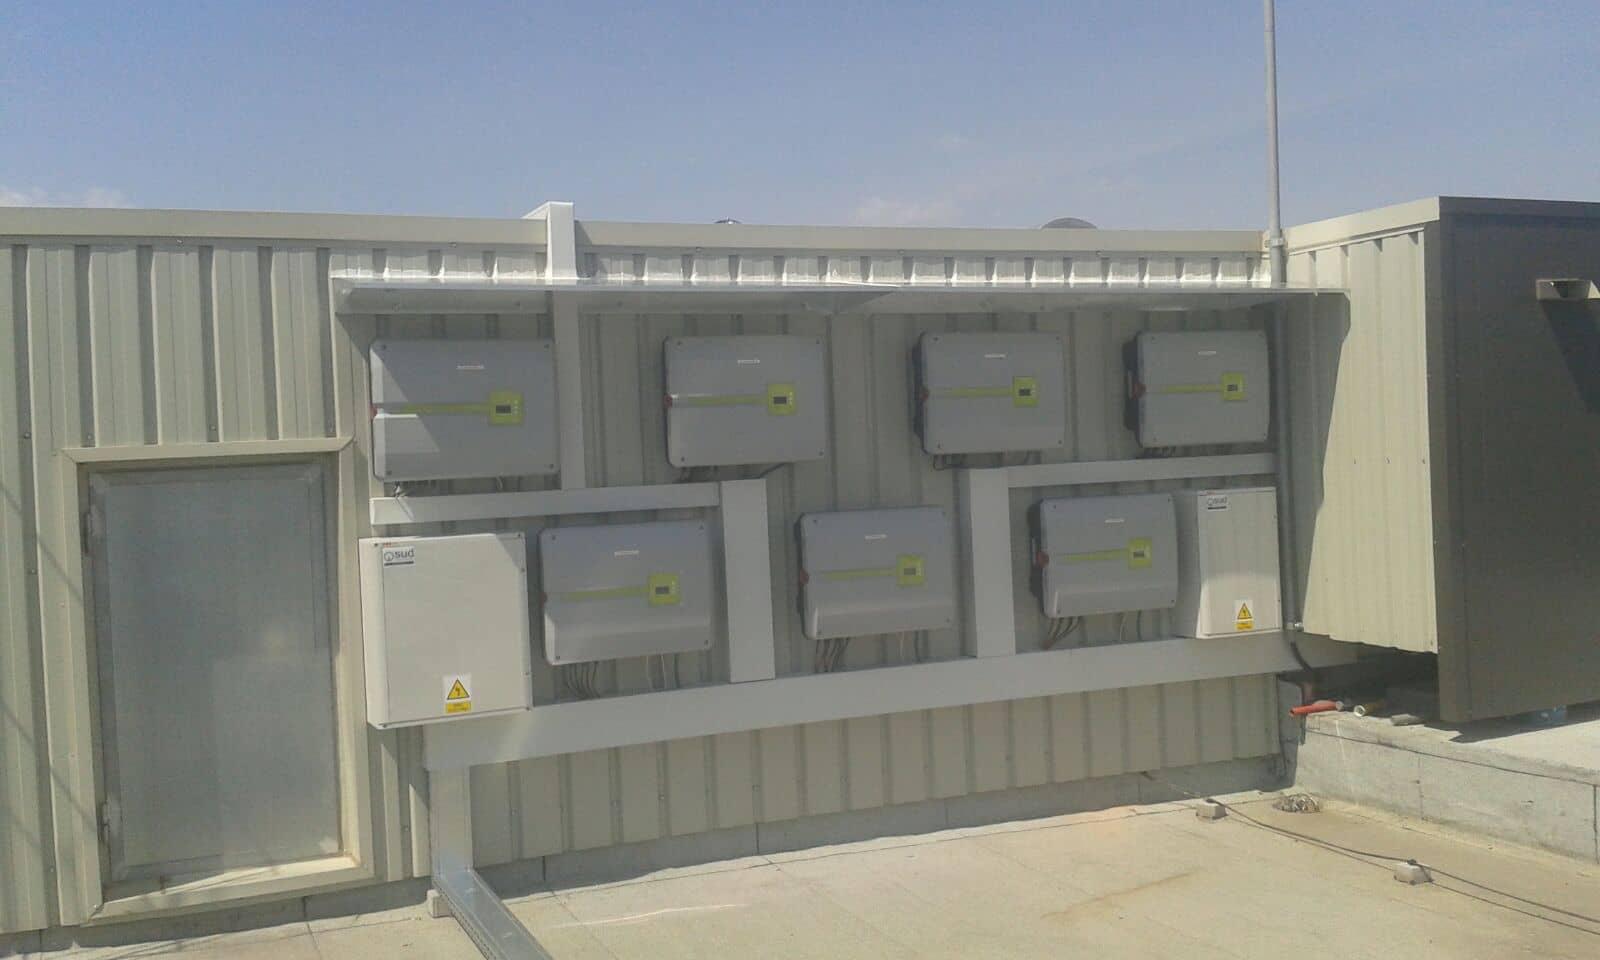 Tarragonès 159,88 kWp Image